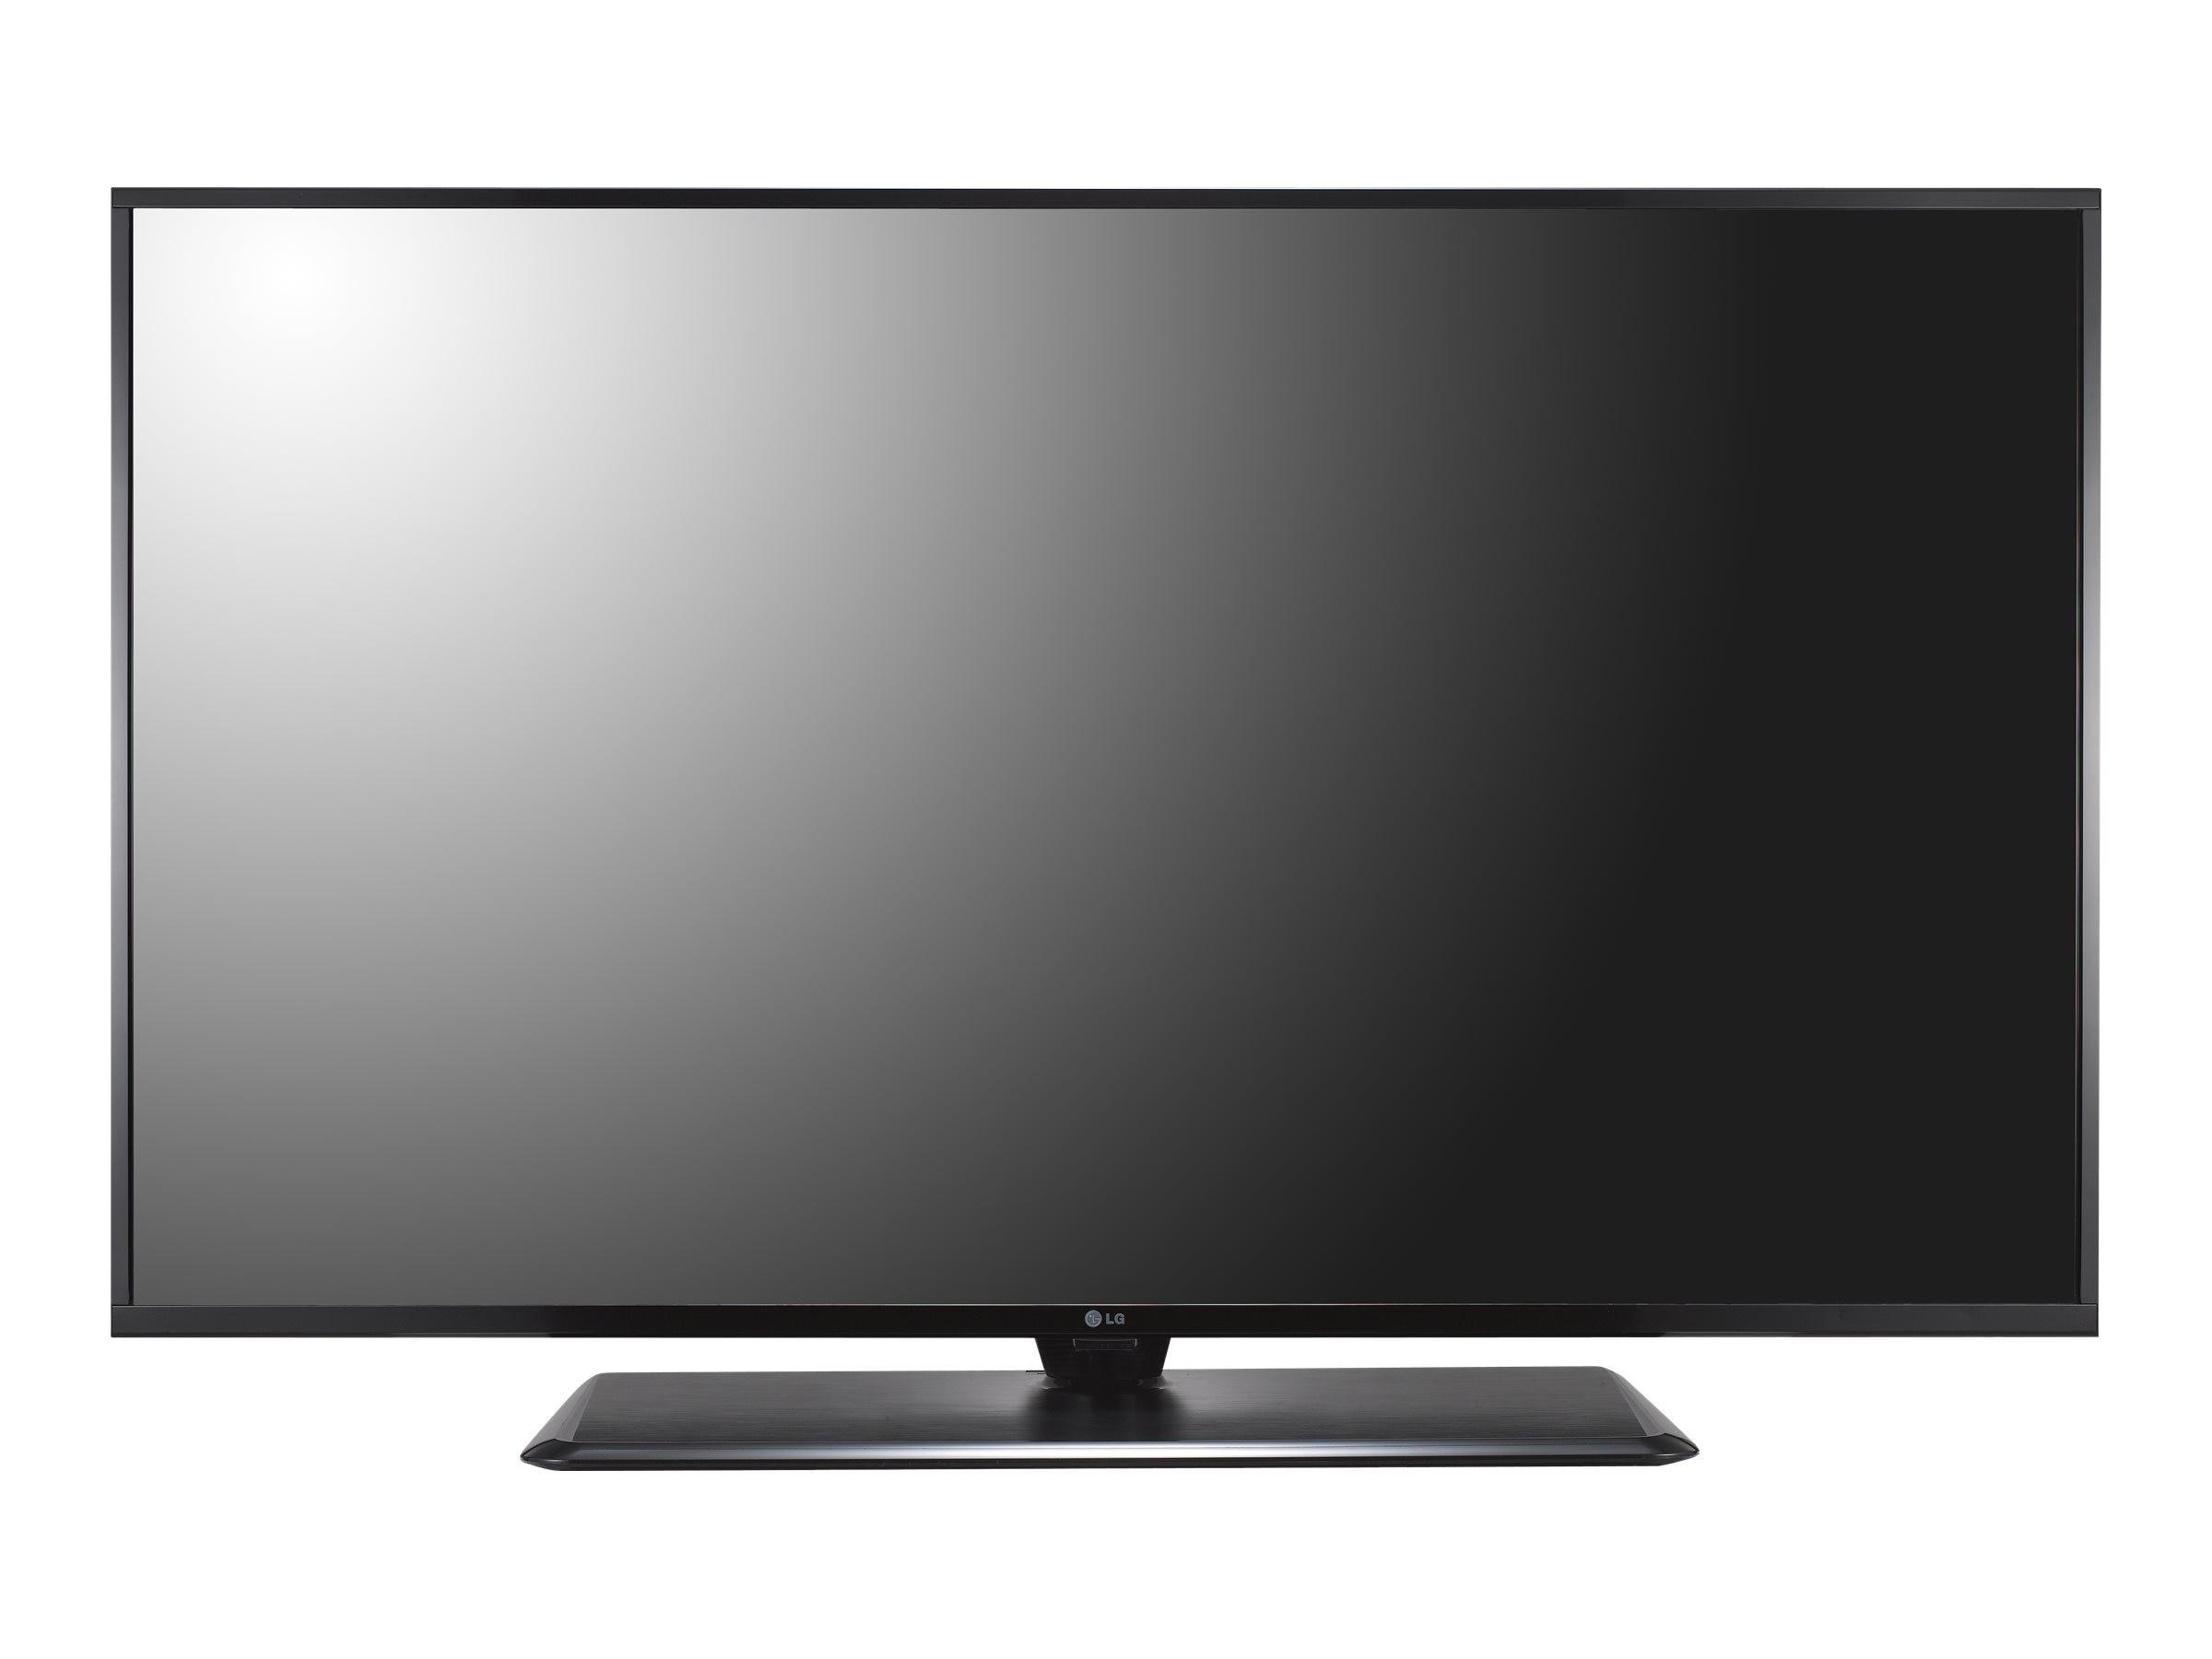 LG Electronics 40LX560H Image 1